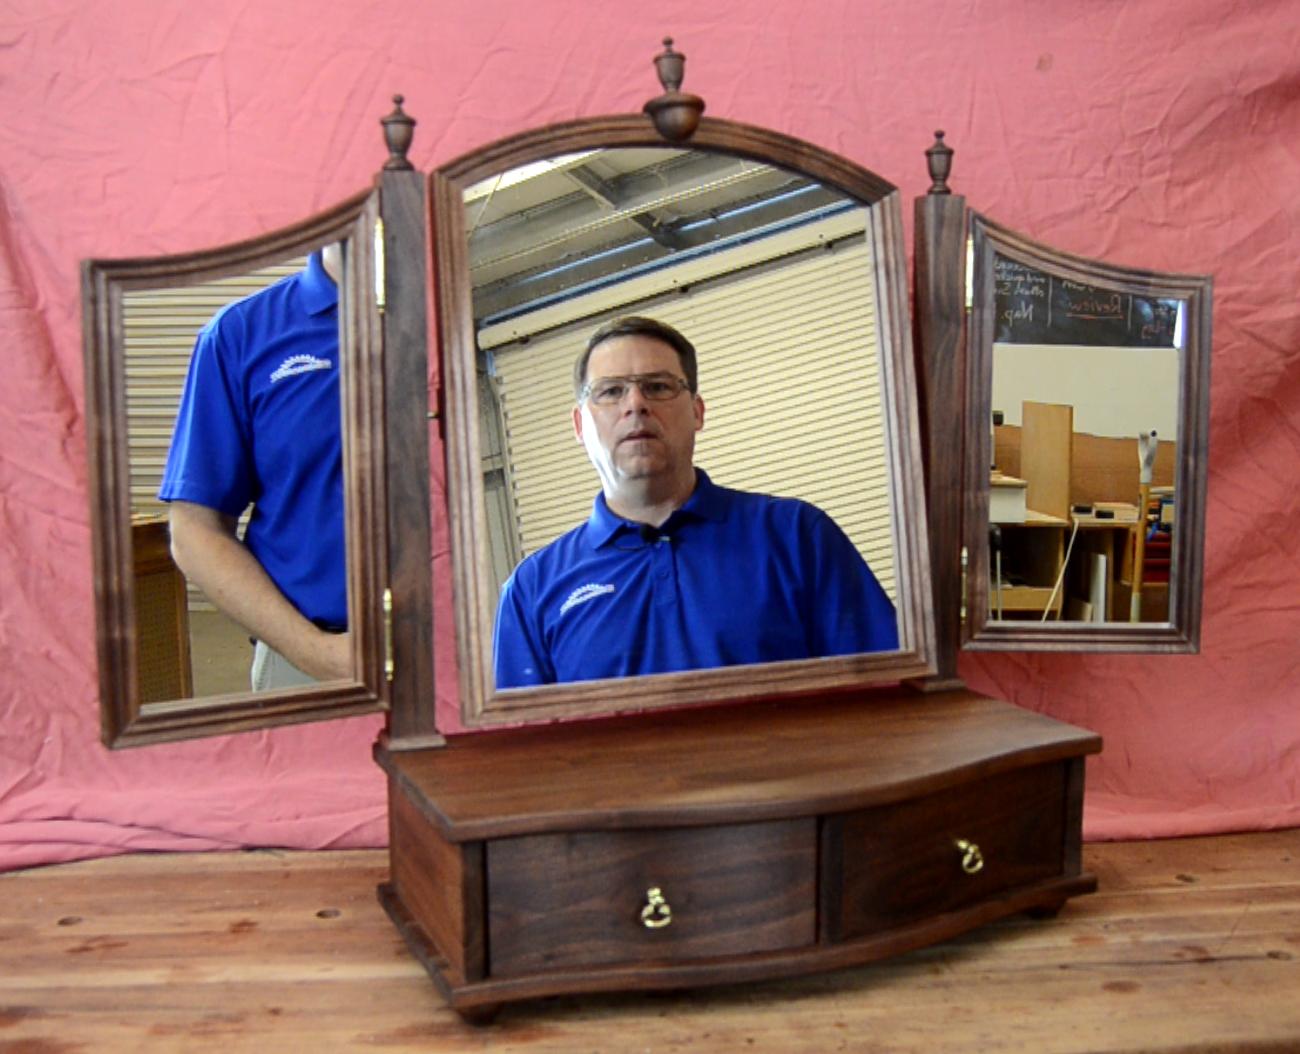 S2 E5 Triptych Dressing Mirror